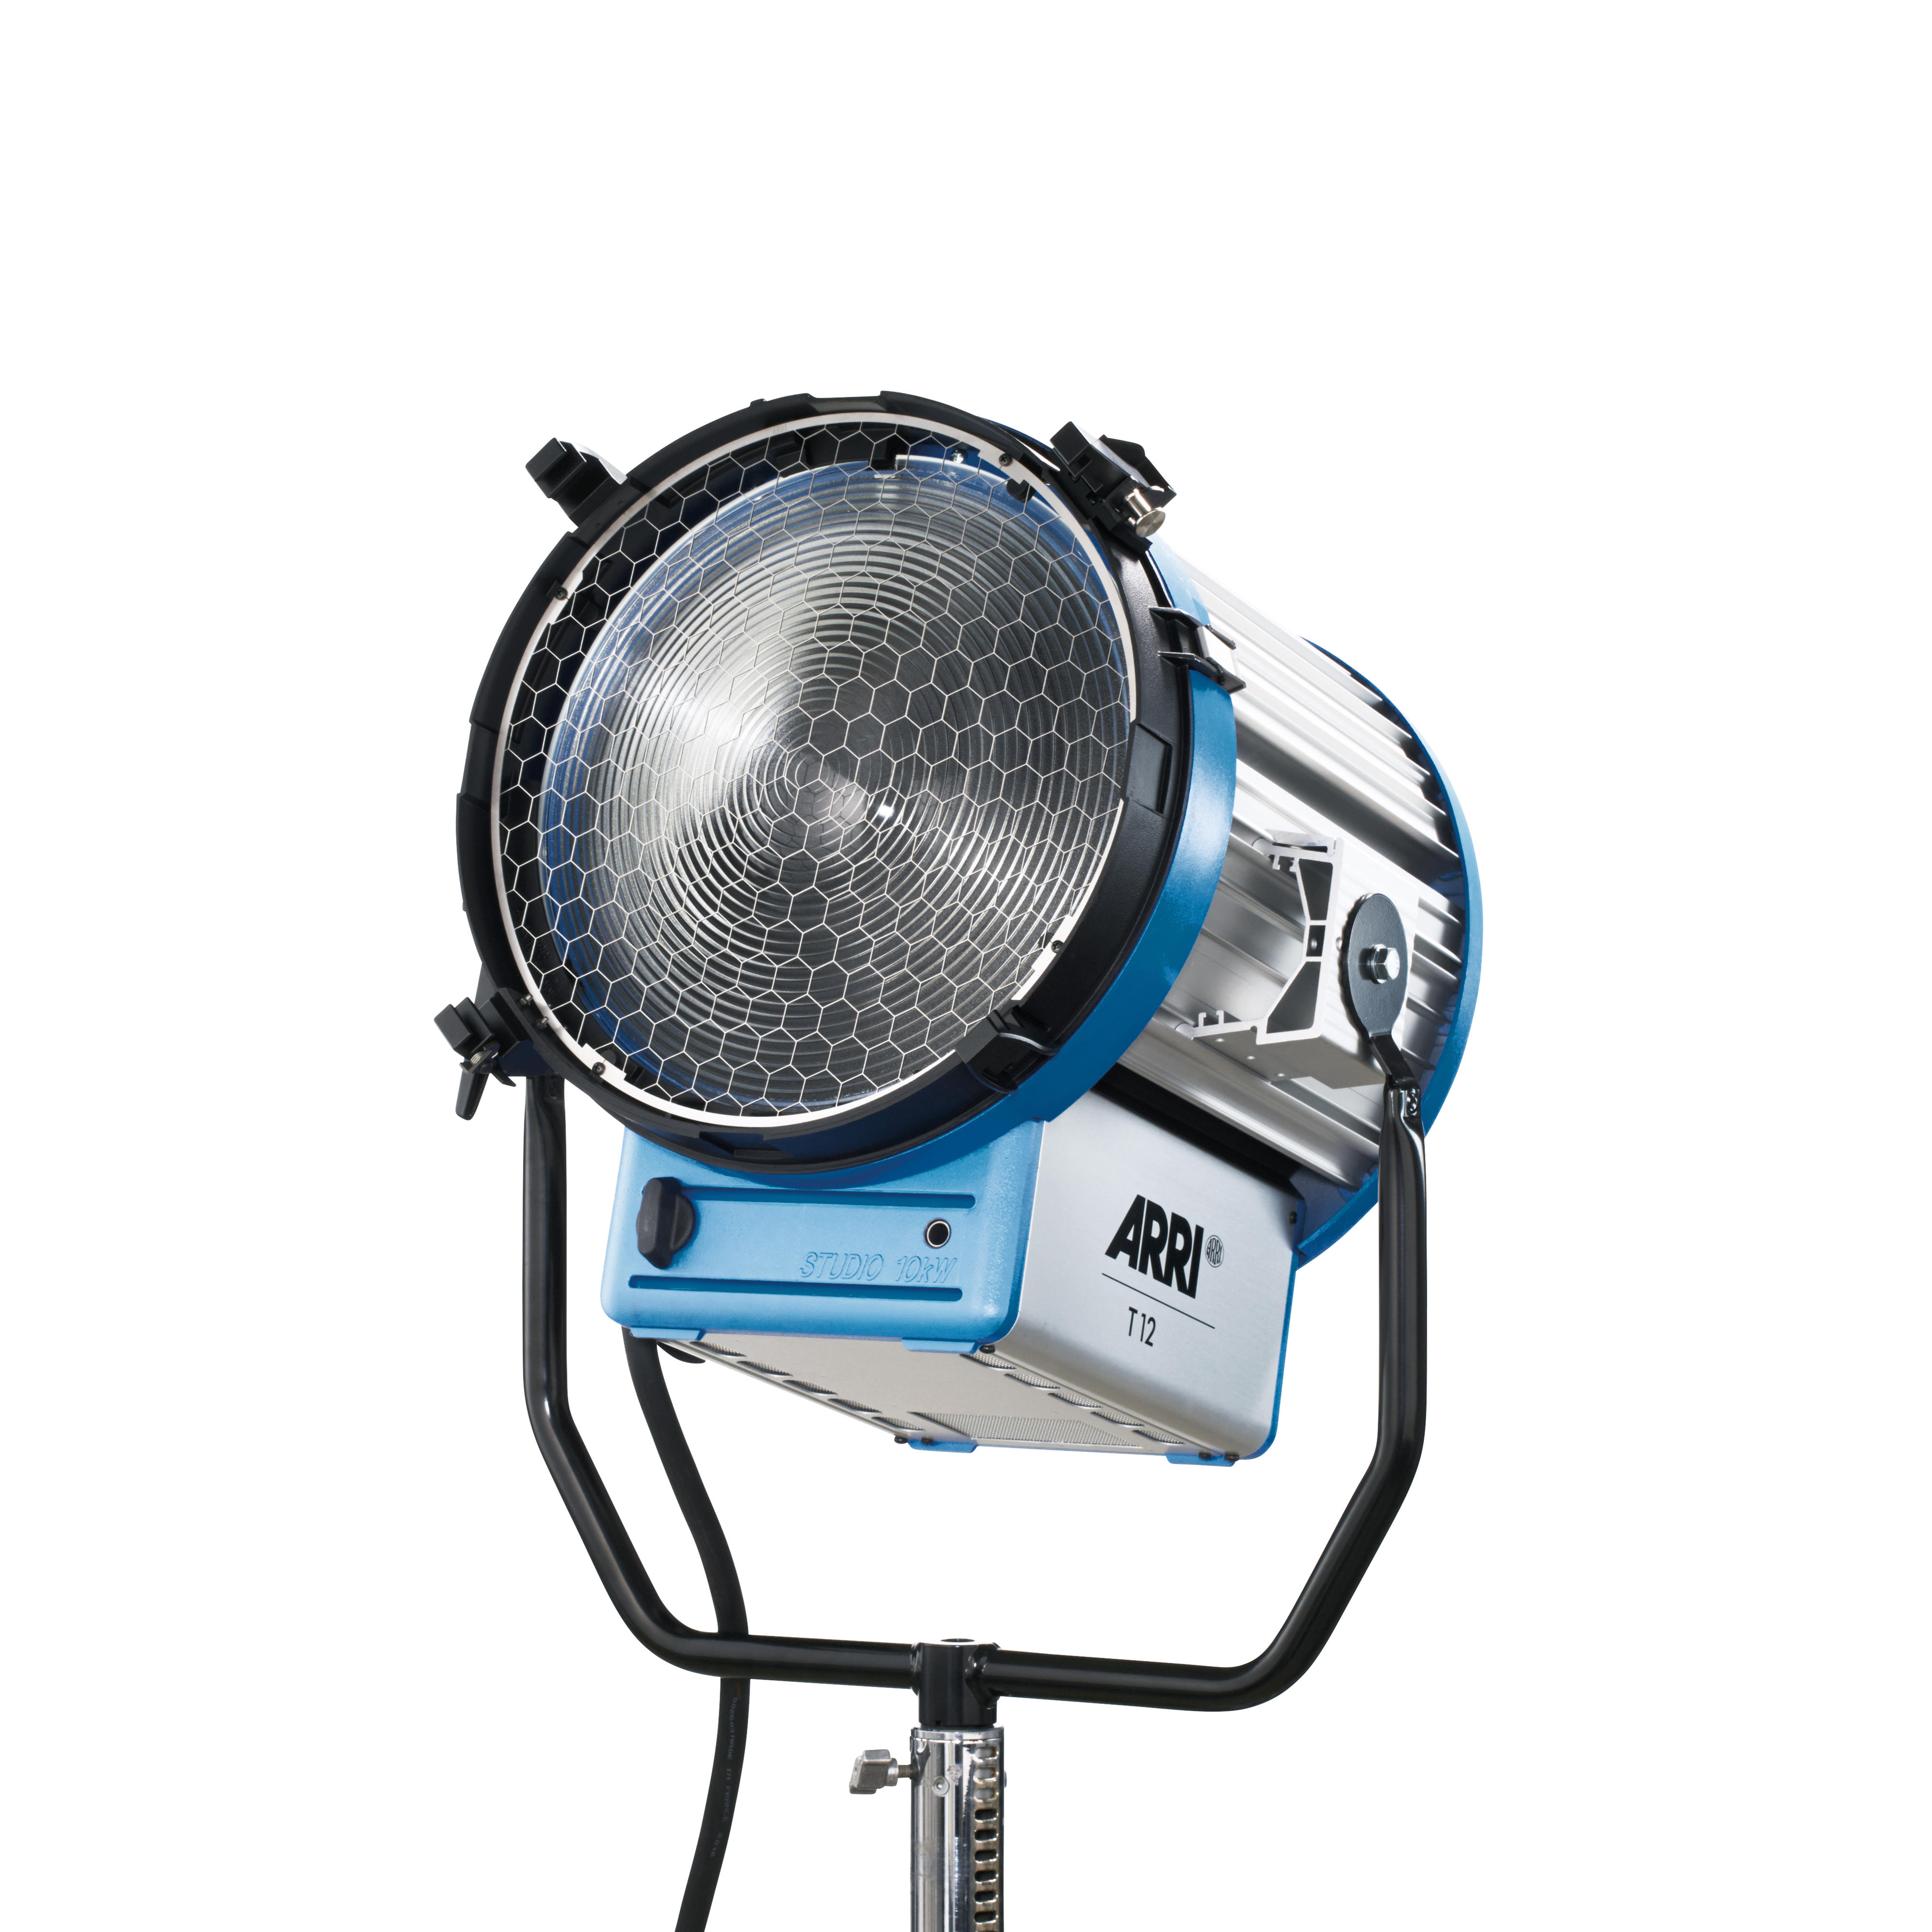 Studio Lighting For Sale: Studio T12